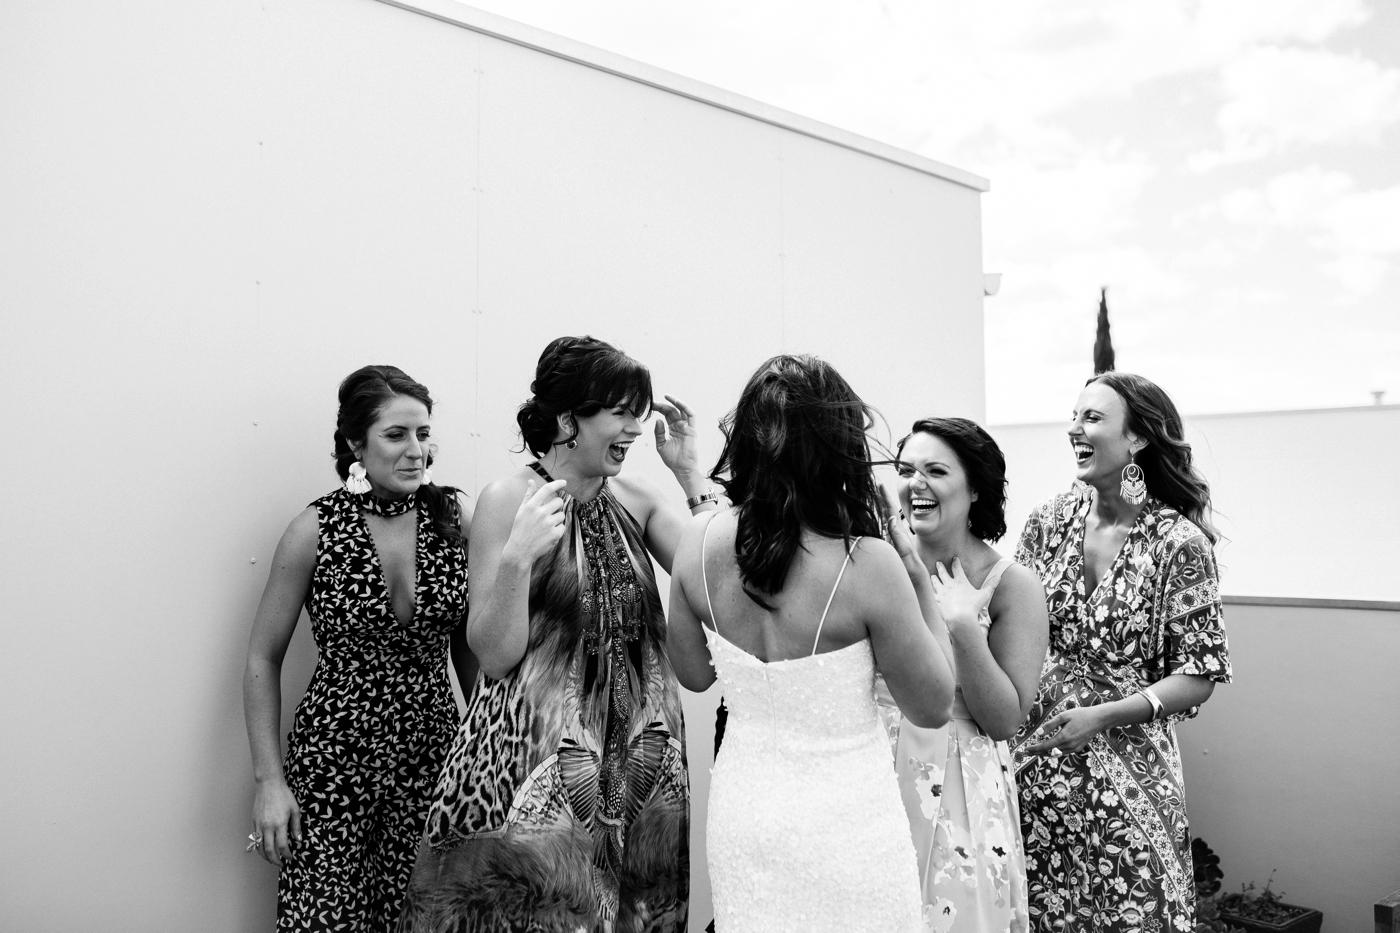 Kellie & Brent - Adelaide City Wedding - Natural wedding photography in Adelaide - Katherine Schultz - www.katherineschultzphotography.com 13